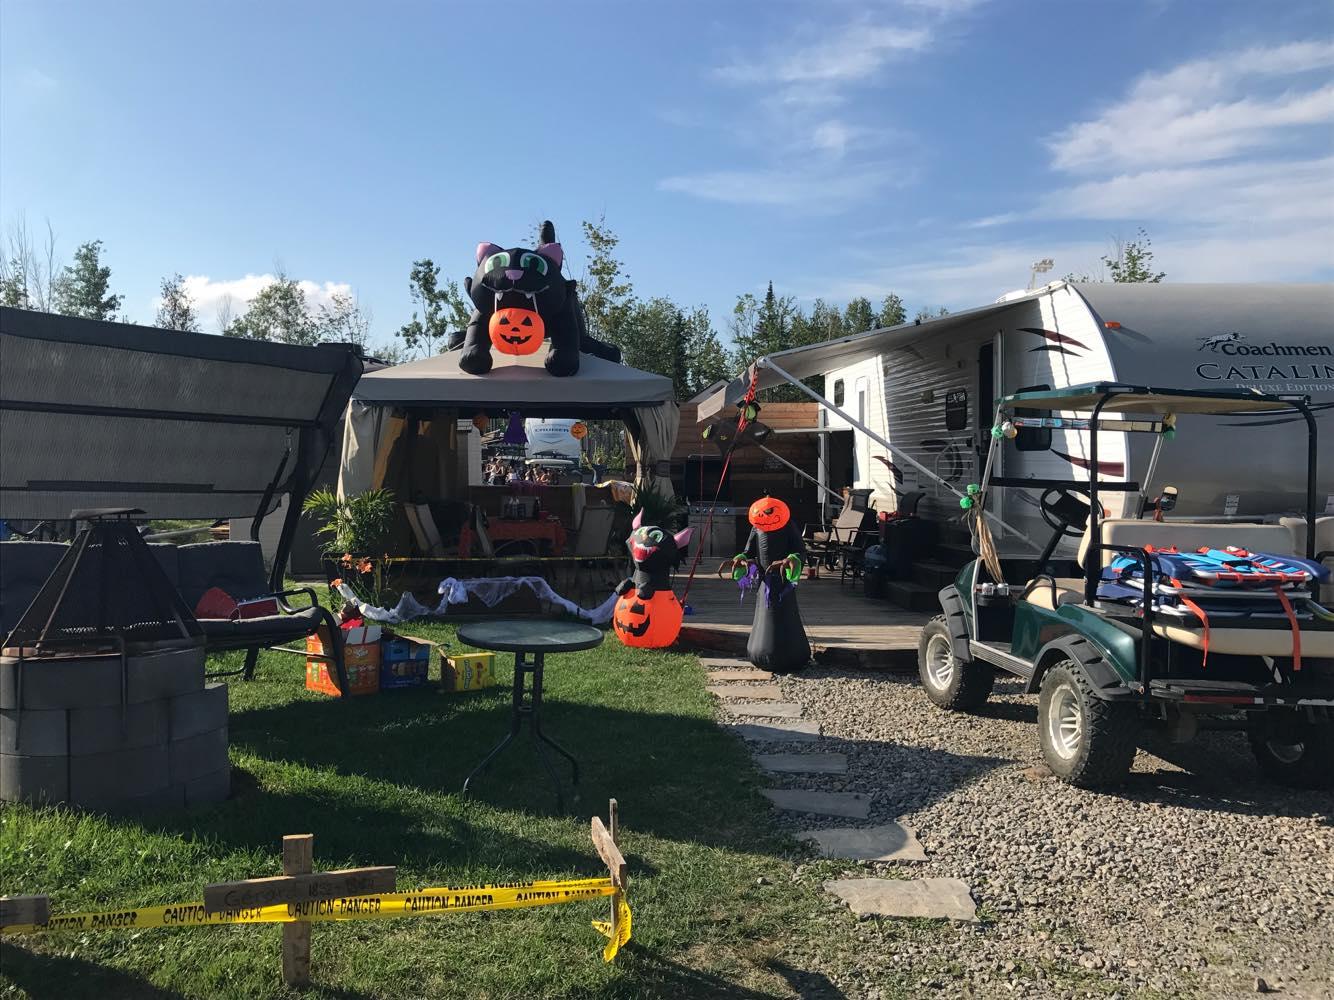 http://www.campingatlantide.com/wp-content/uploads/2018/08/halloween-complexe-atlantide-2018-6.jpg